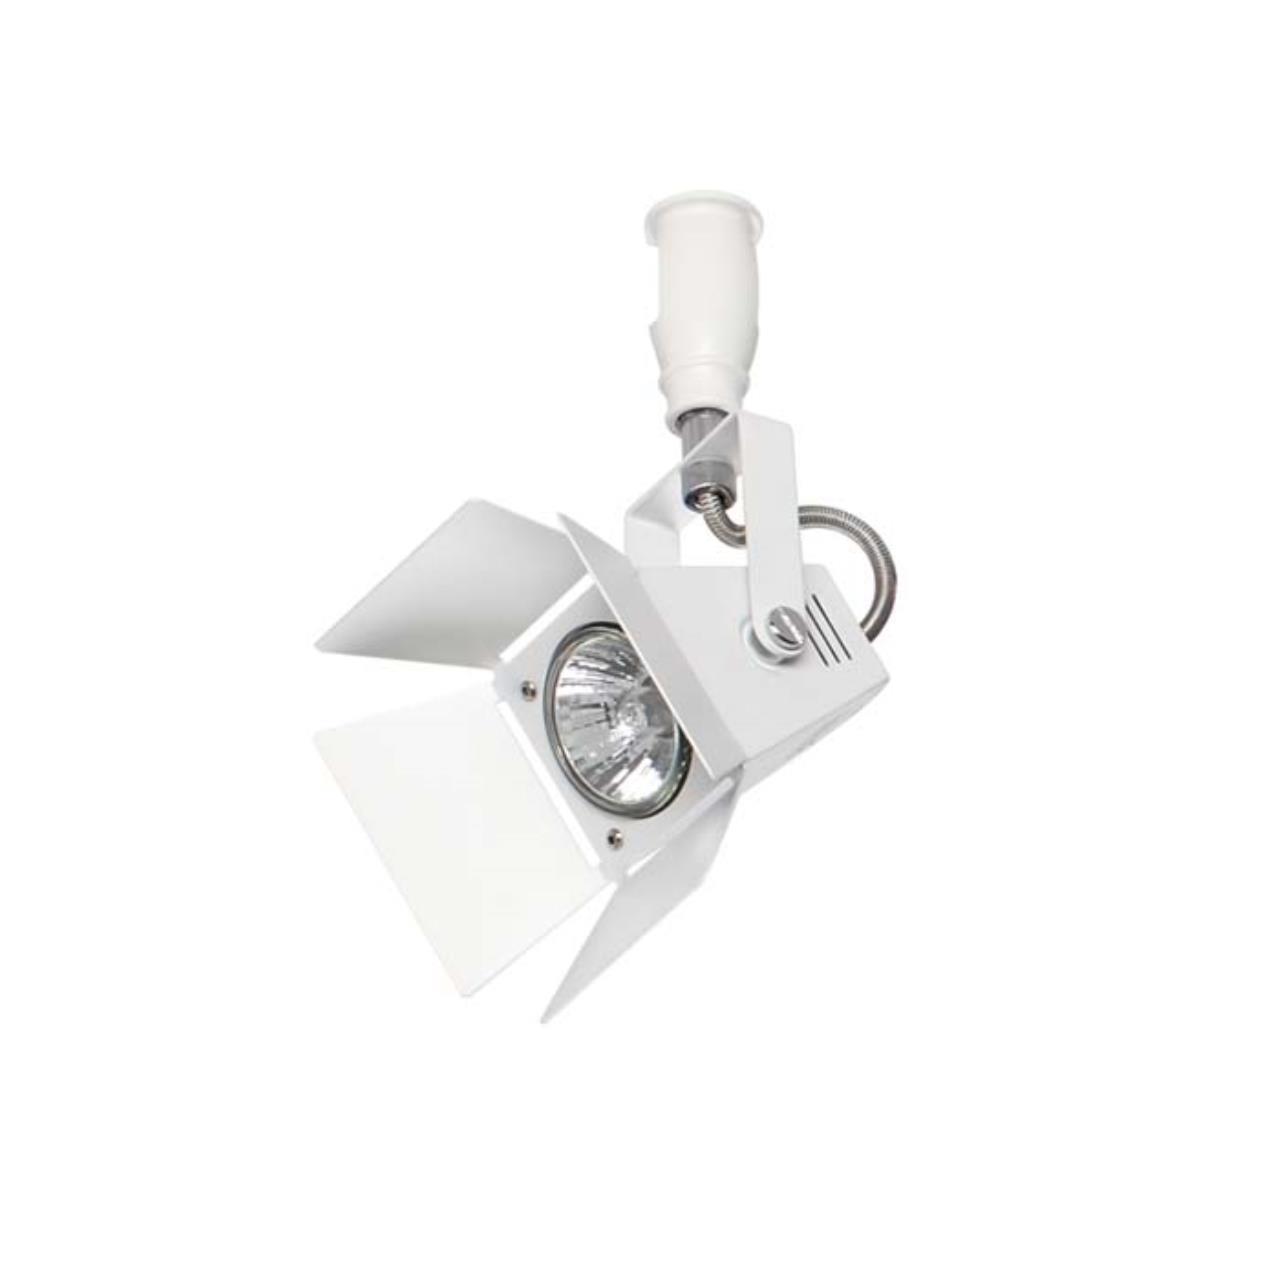 3631/1 MODERN ODL18 271 Плафон для трека IP20 GU10 50W 220V TECHNO PRO